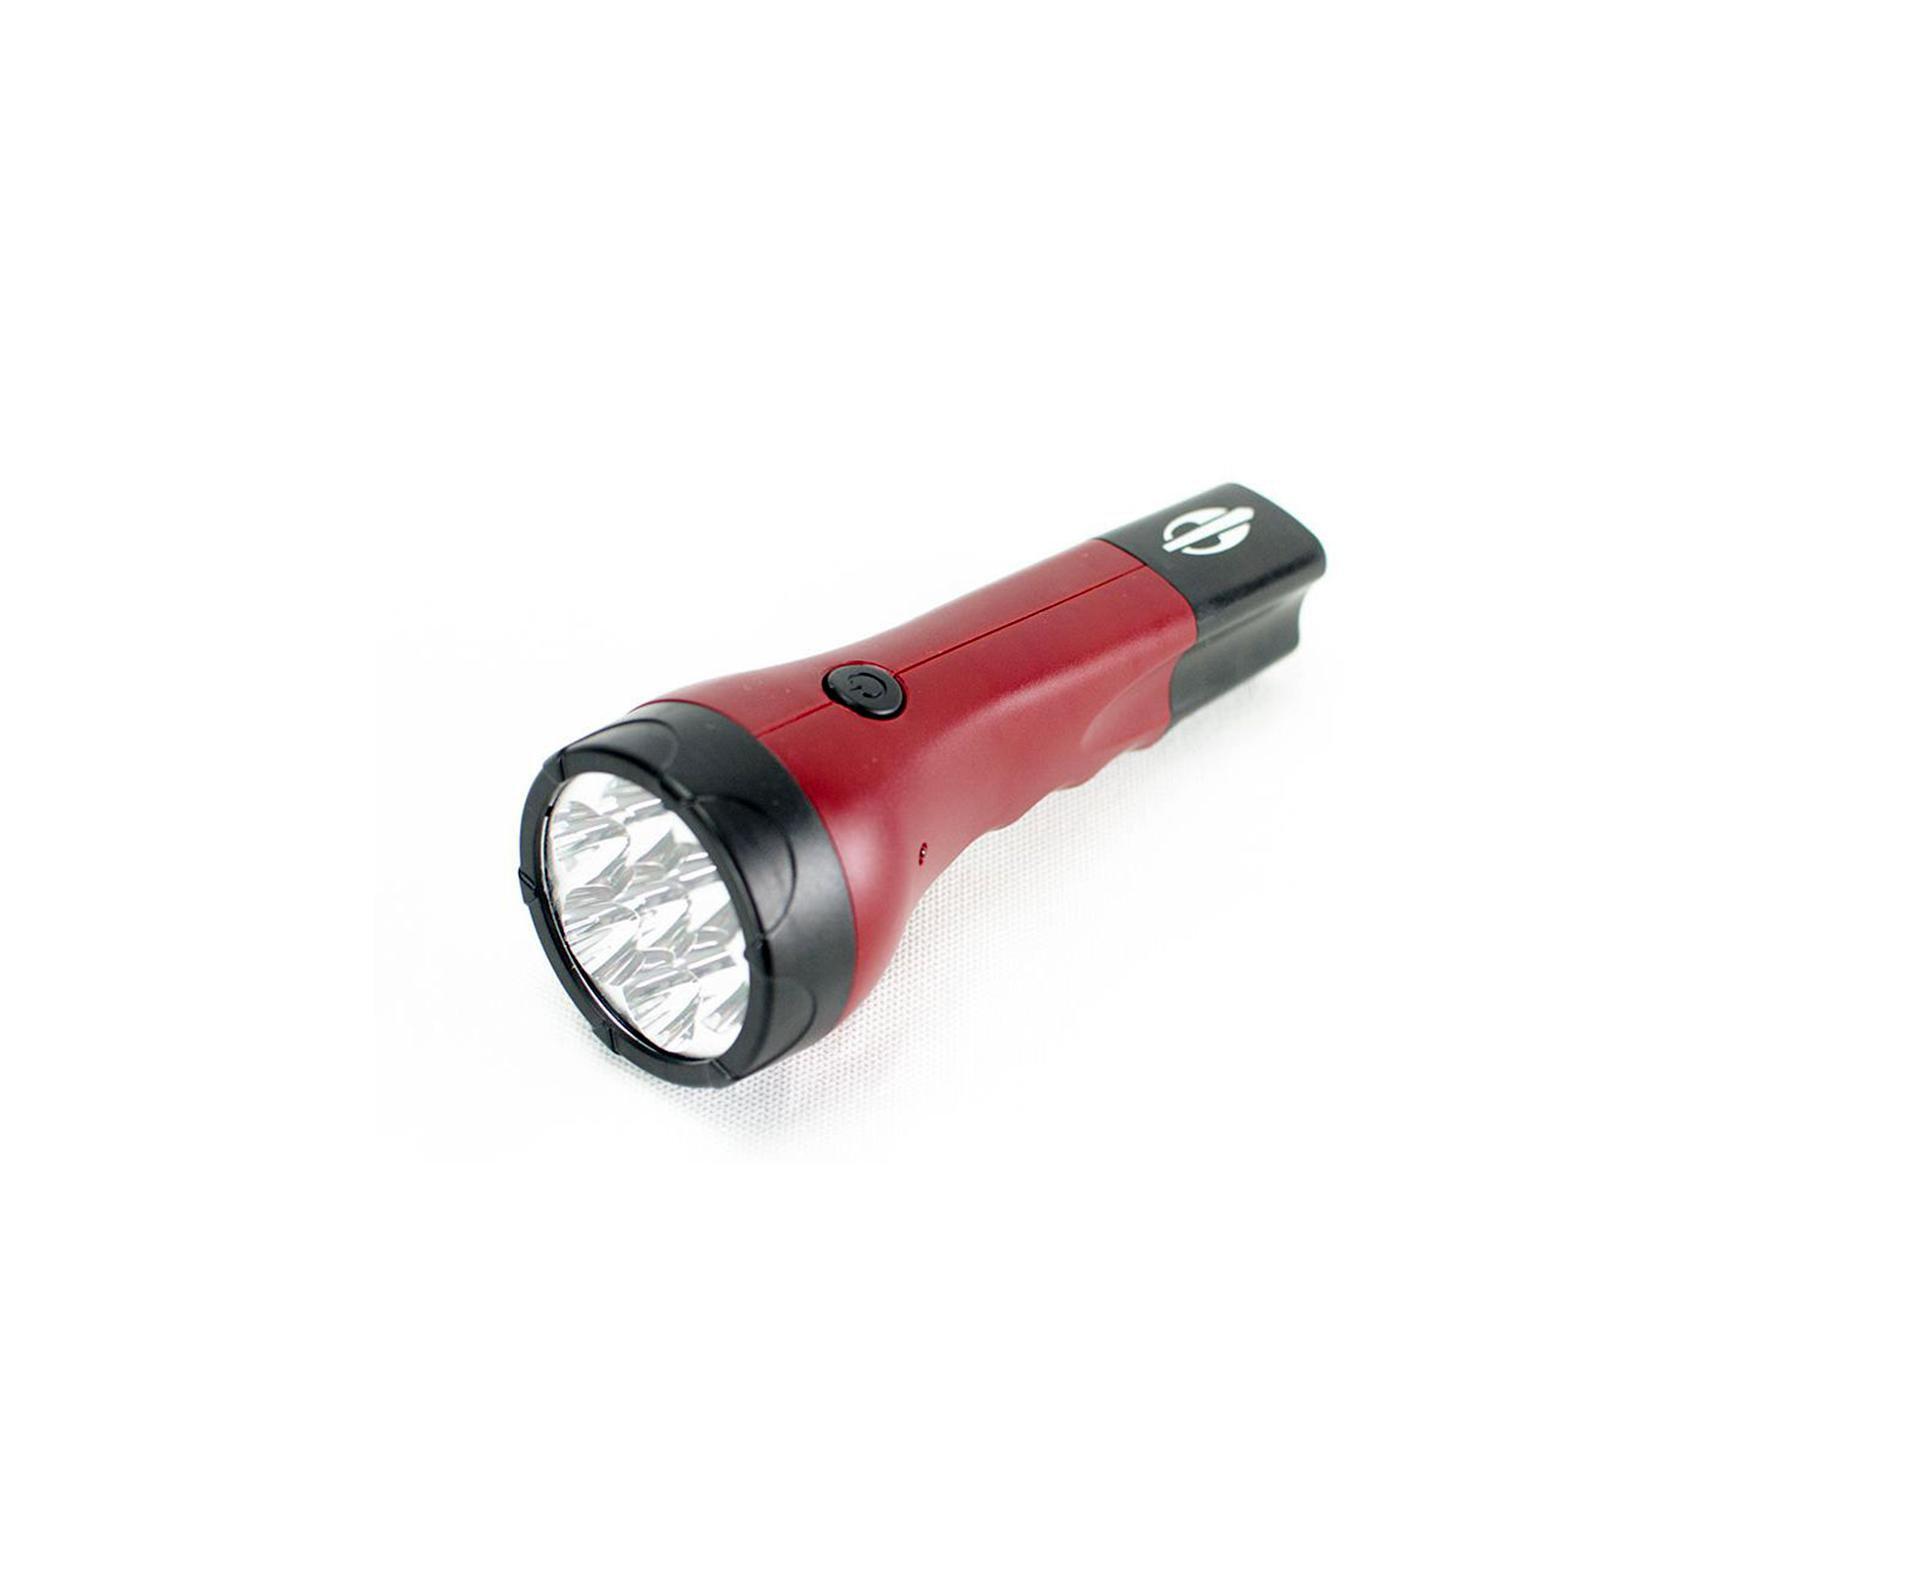 Lanterna Recarregavel 7 Led Charger Ii - Mormaii